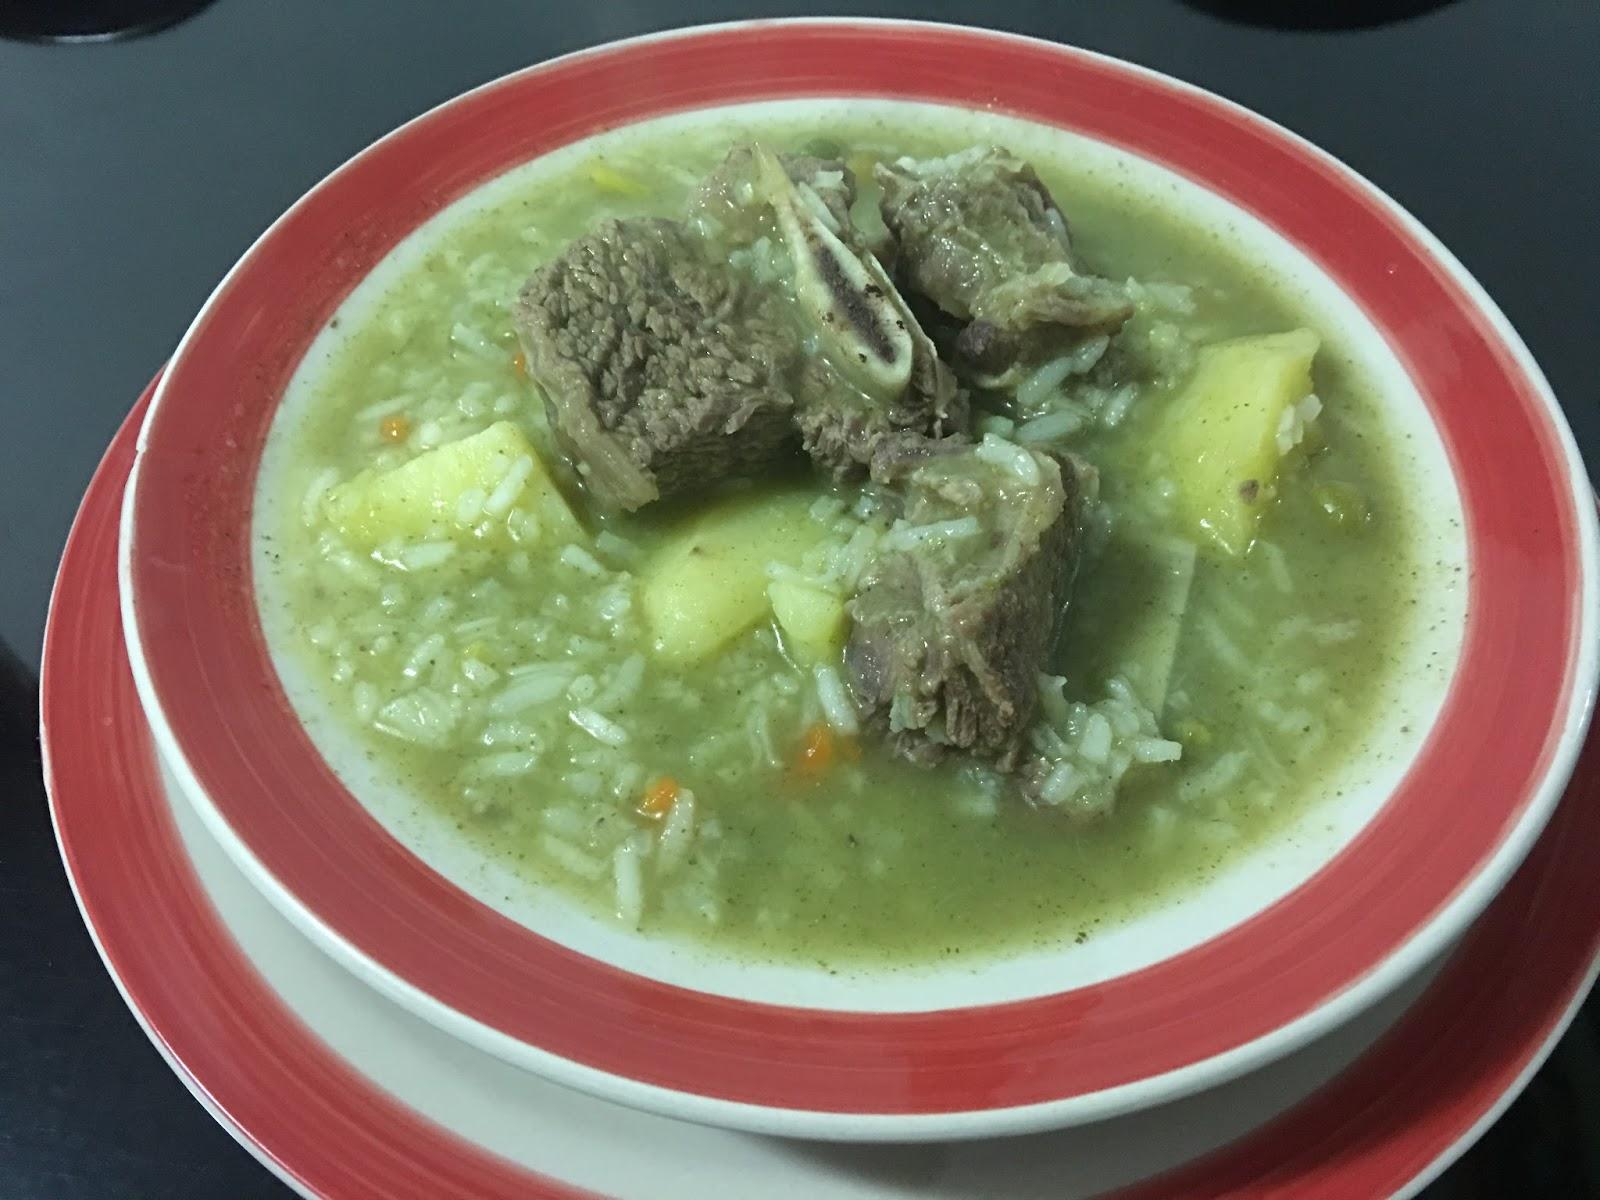 Recetas de cocina ecuatoriana for Que hacer de cenar rapido